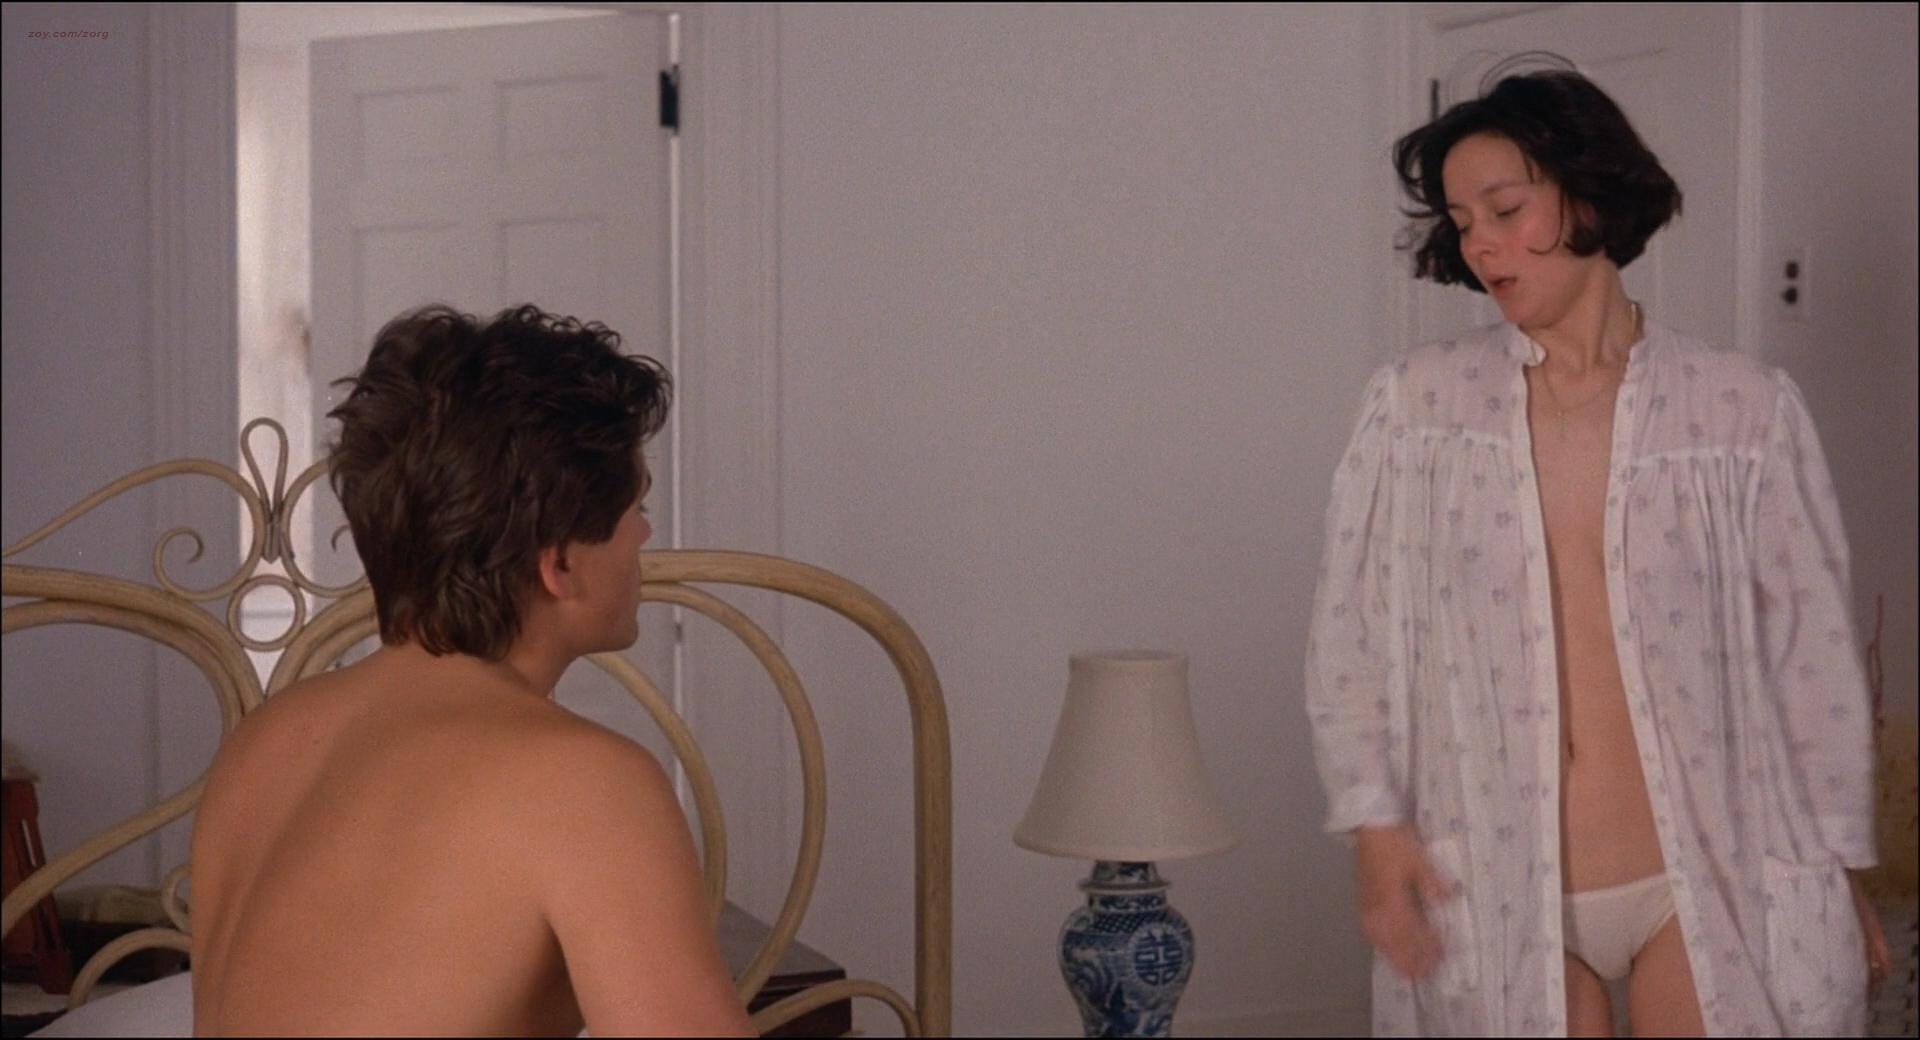 Kim Cattrall nude topless Meg Tilly hot sex Dana Delany hot bikini - Masquerade (1988) HD 1080p BluRay (13)